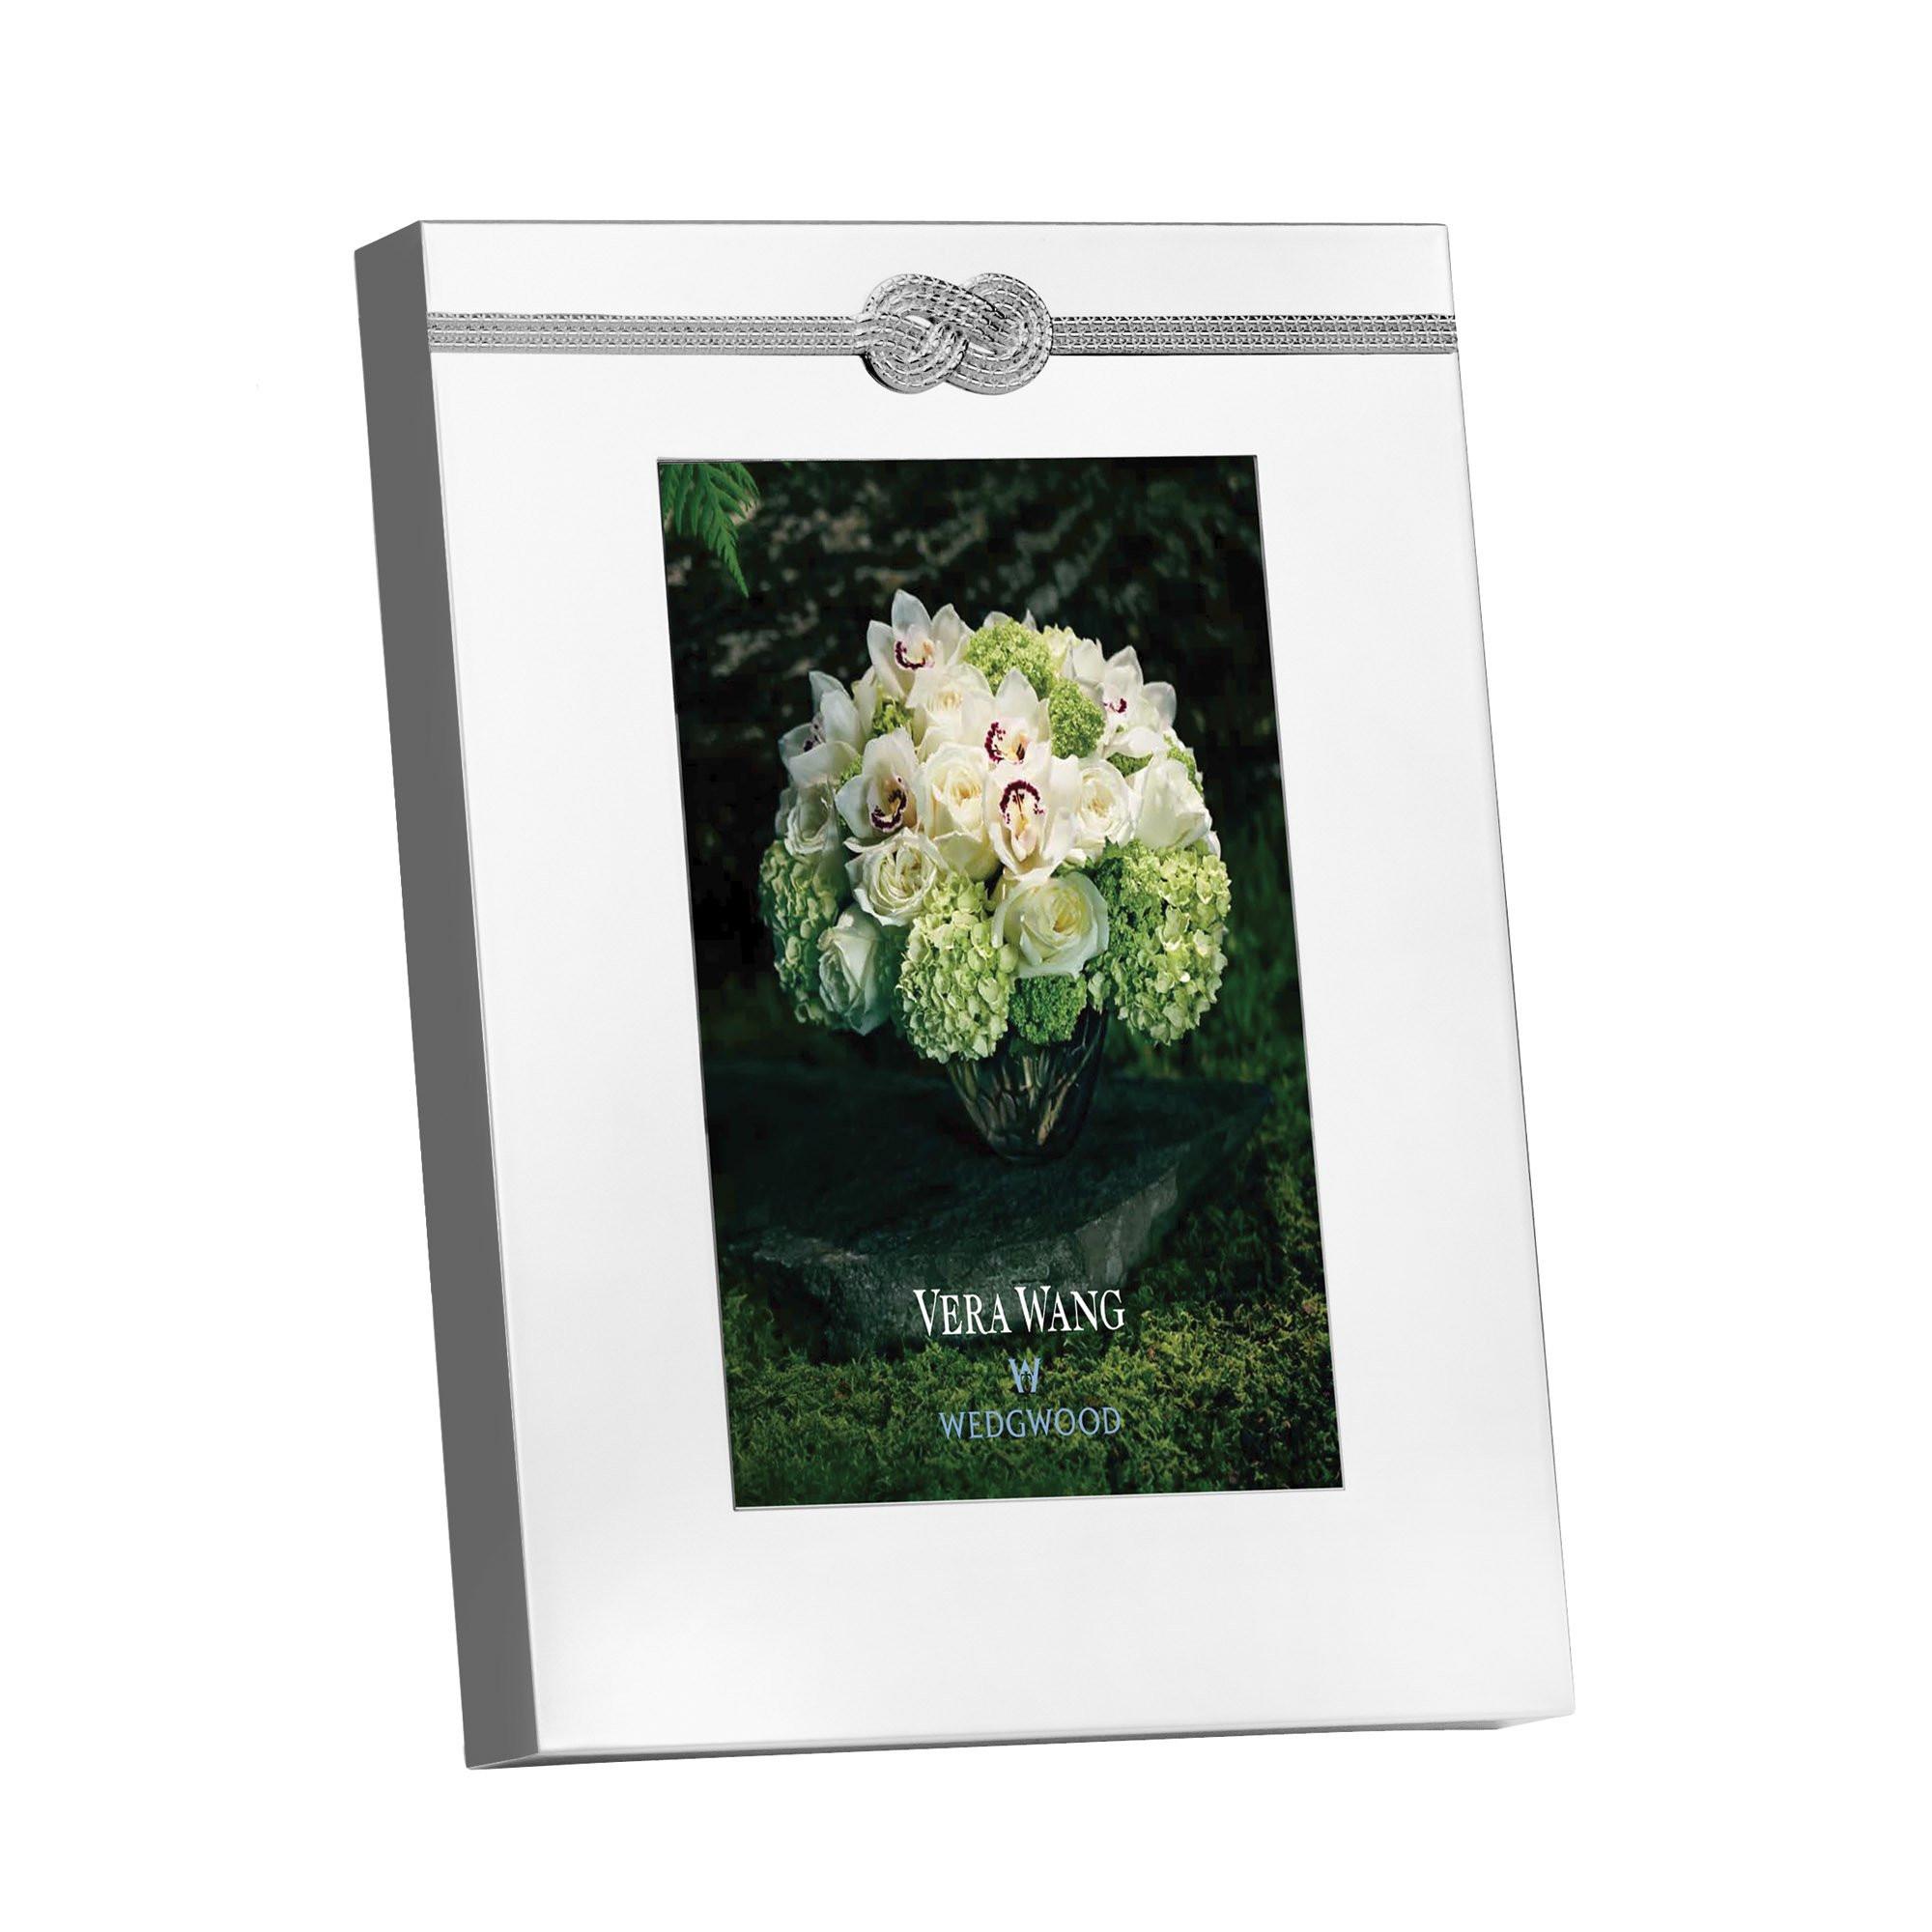 vera wang duchesse encore vase of vera wang collections wedgwooda australia with vera wang infinity frame 5x7